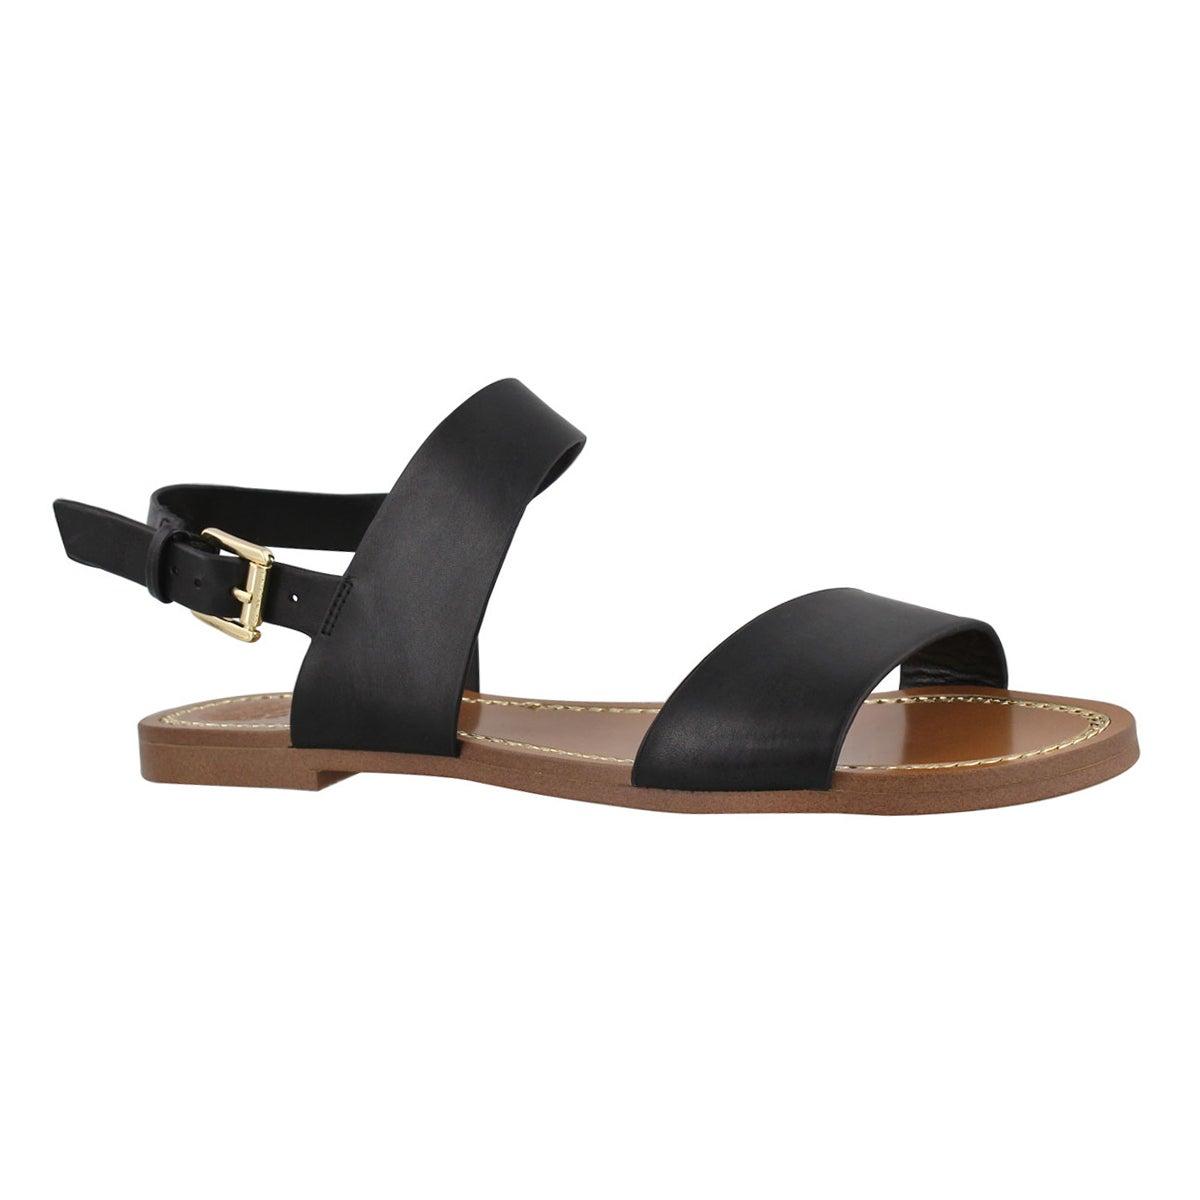 Women's RENTIN black dress sandal